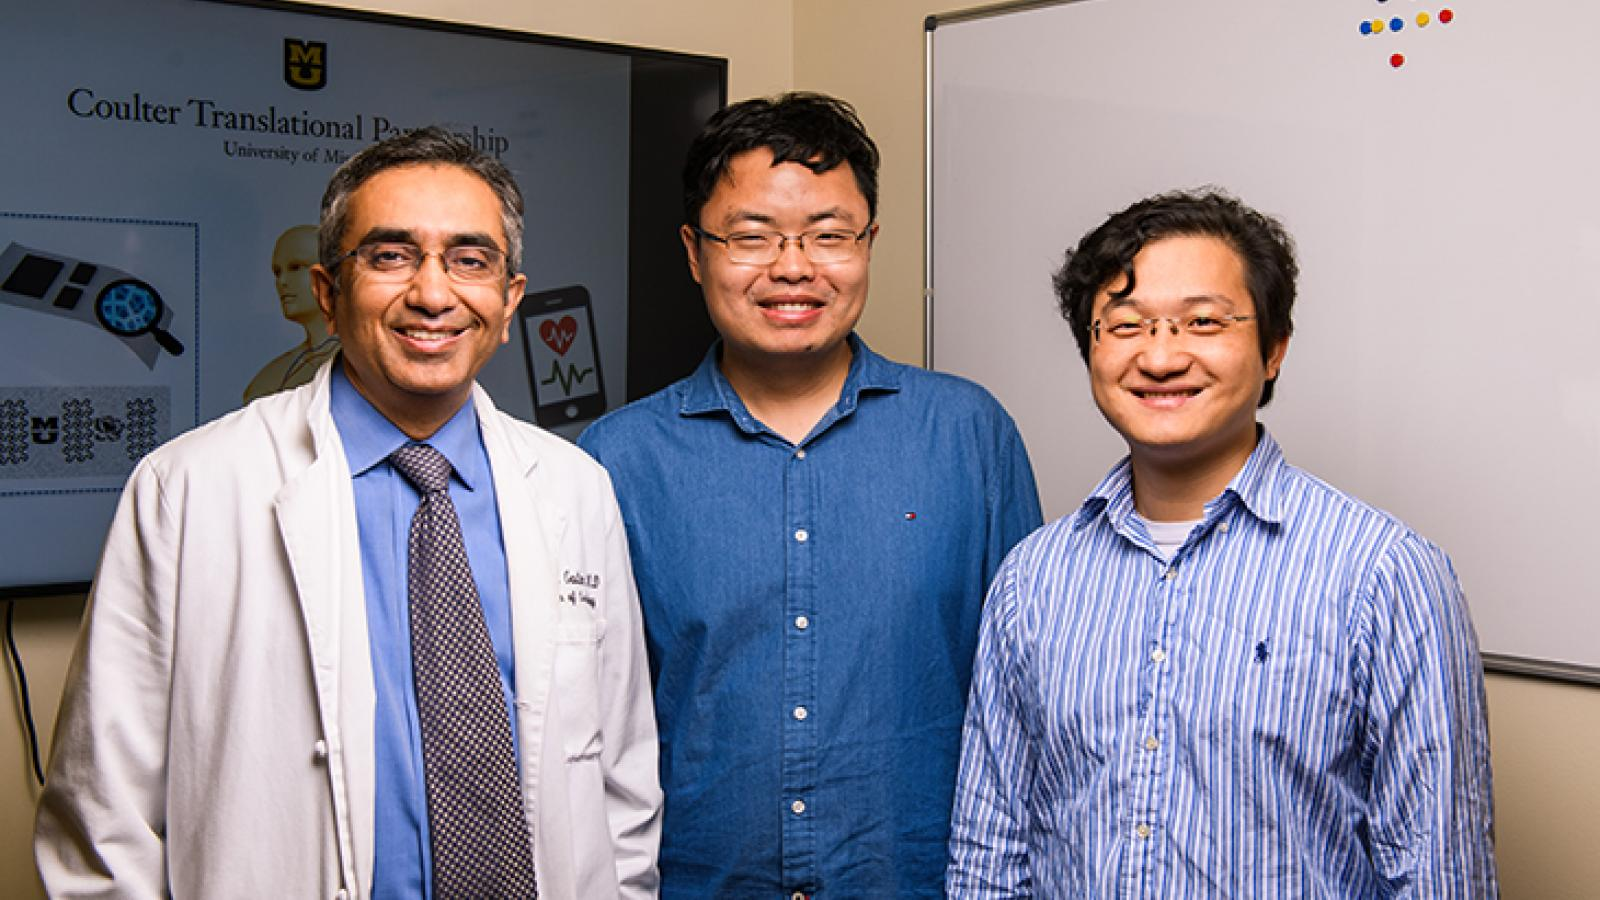 Photo of Dr. Gautam, Dr. Lin and Dr. Yan